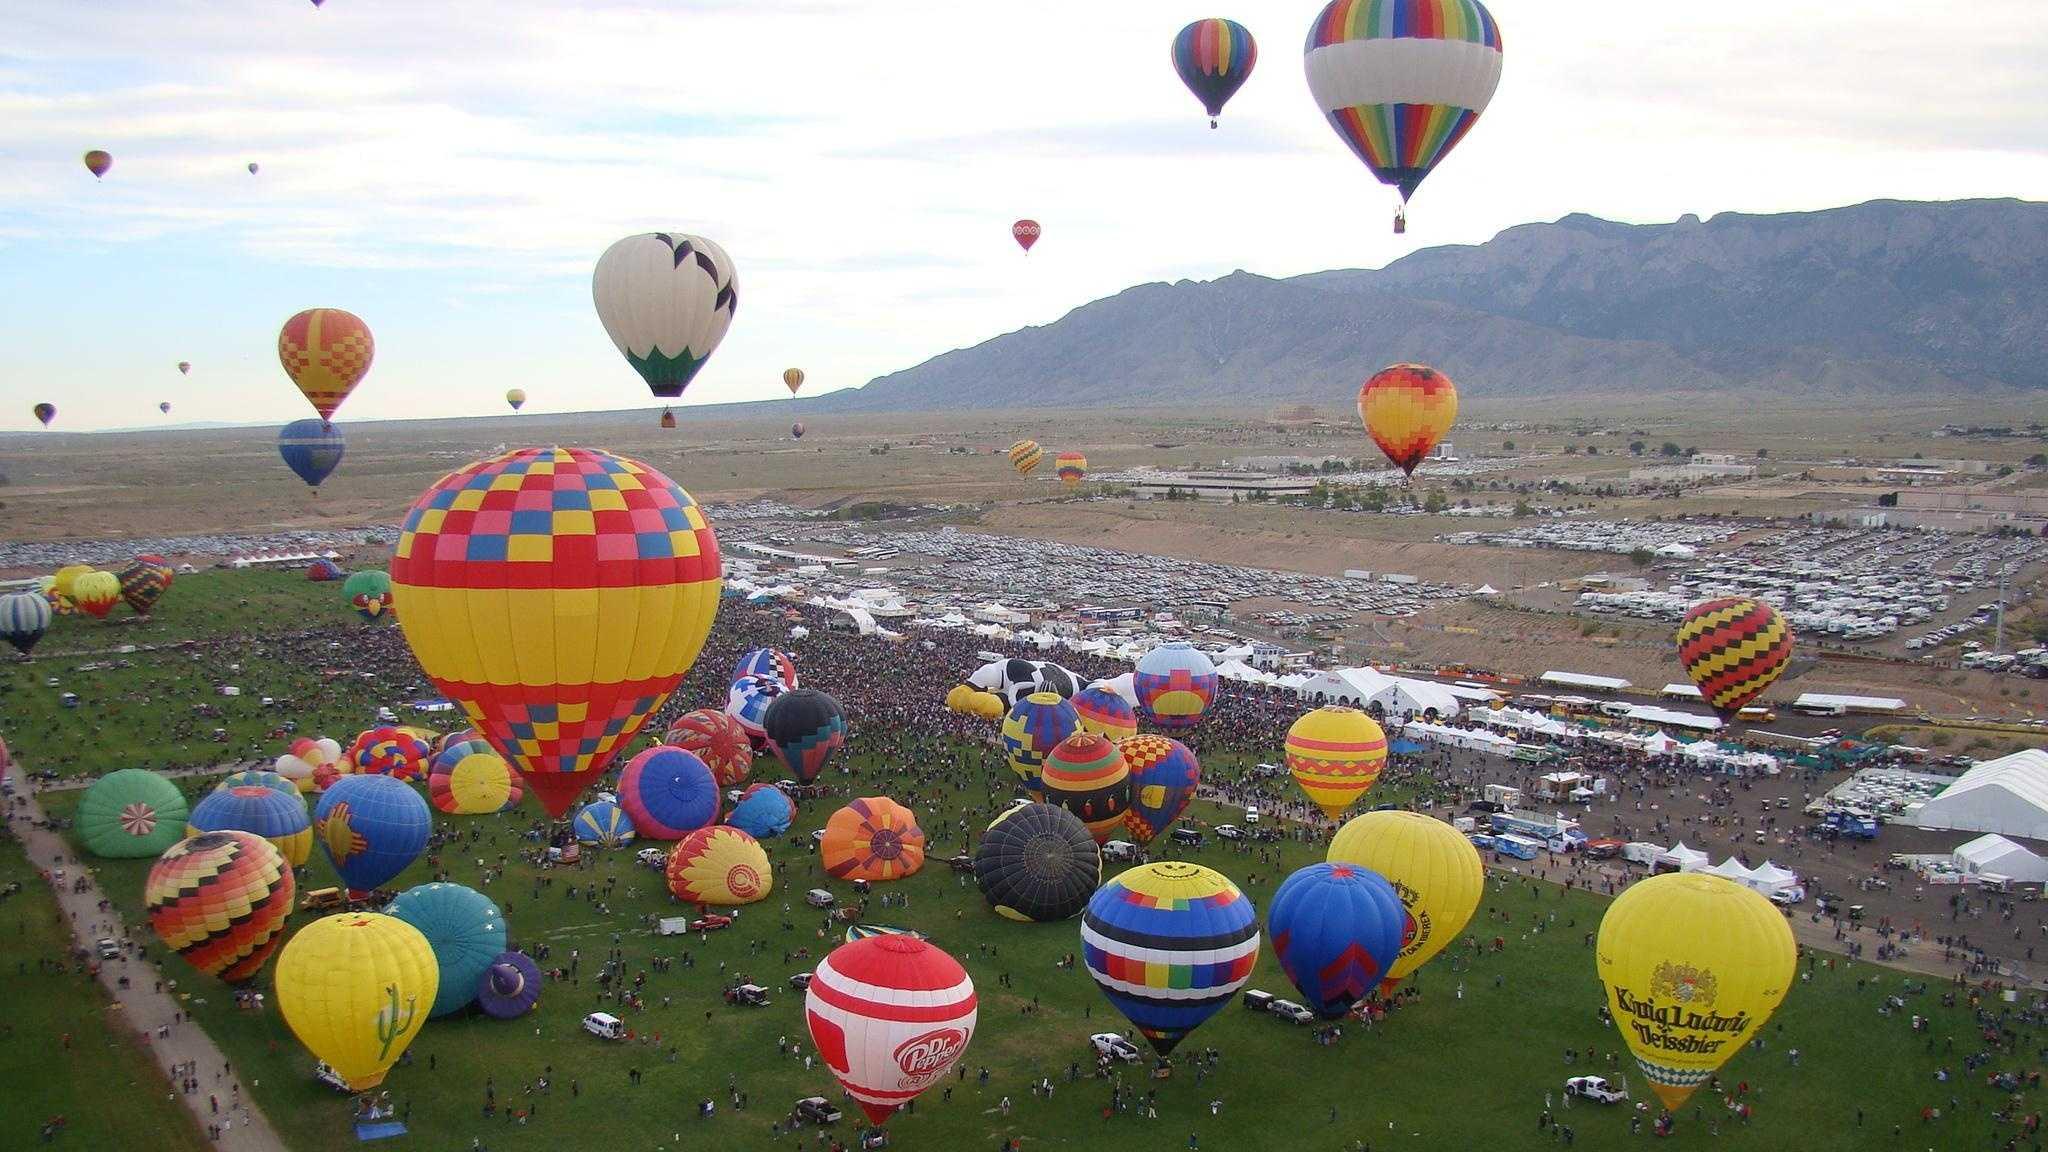 Balloon Fiesta Generic Ulocal - 29161011